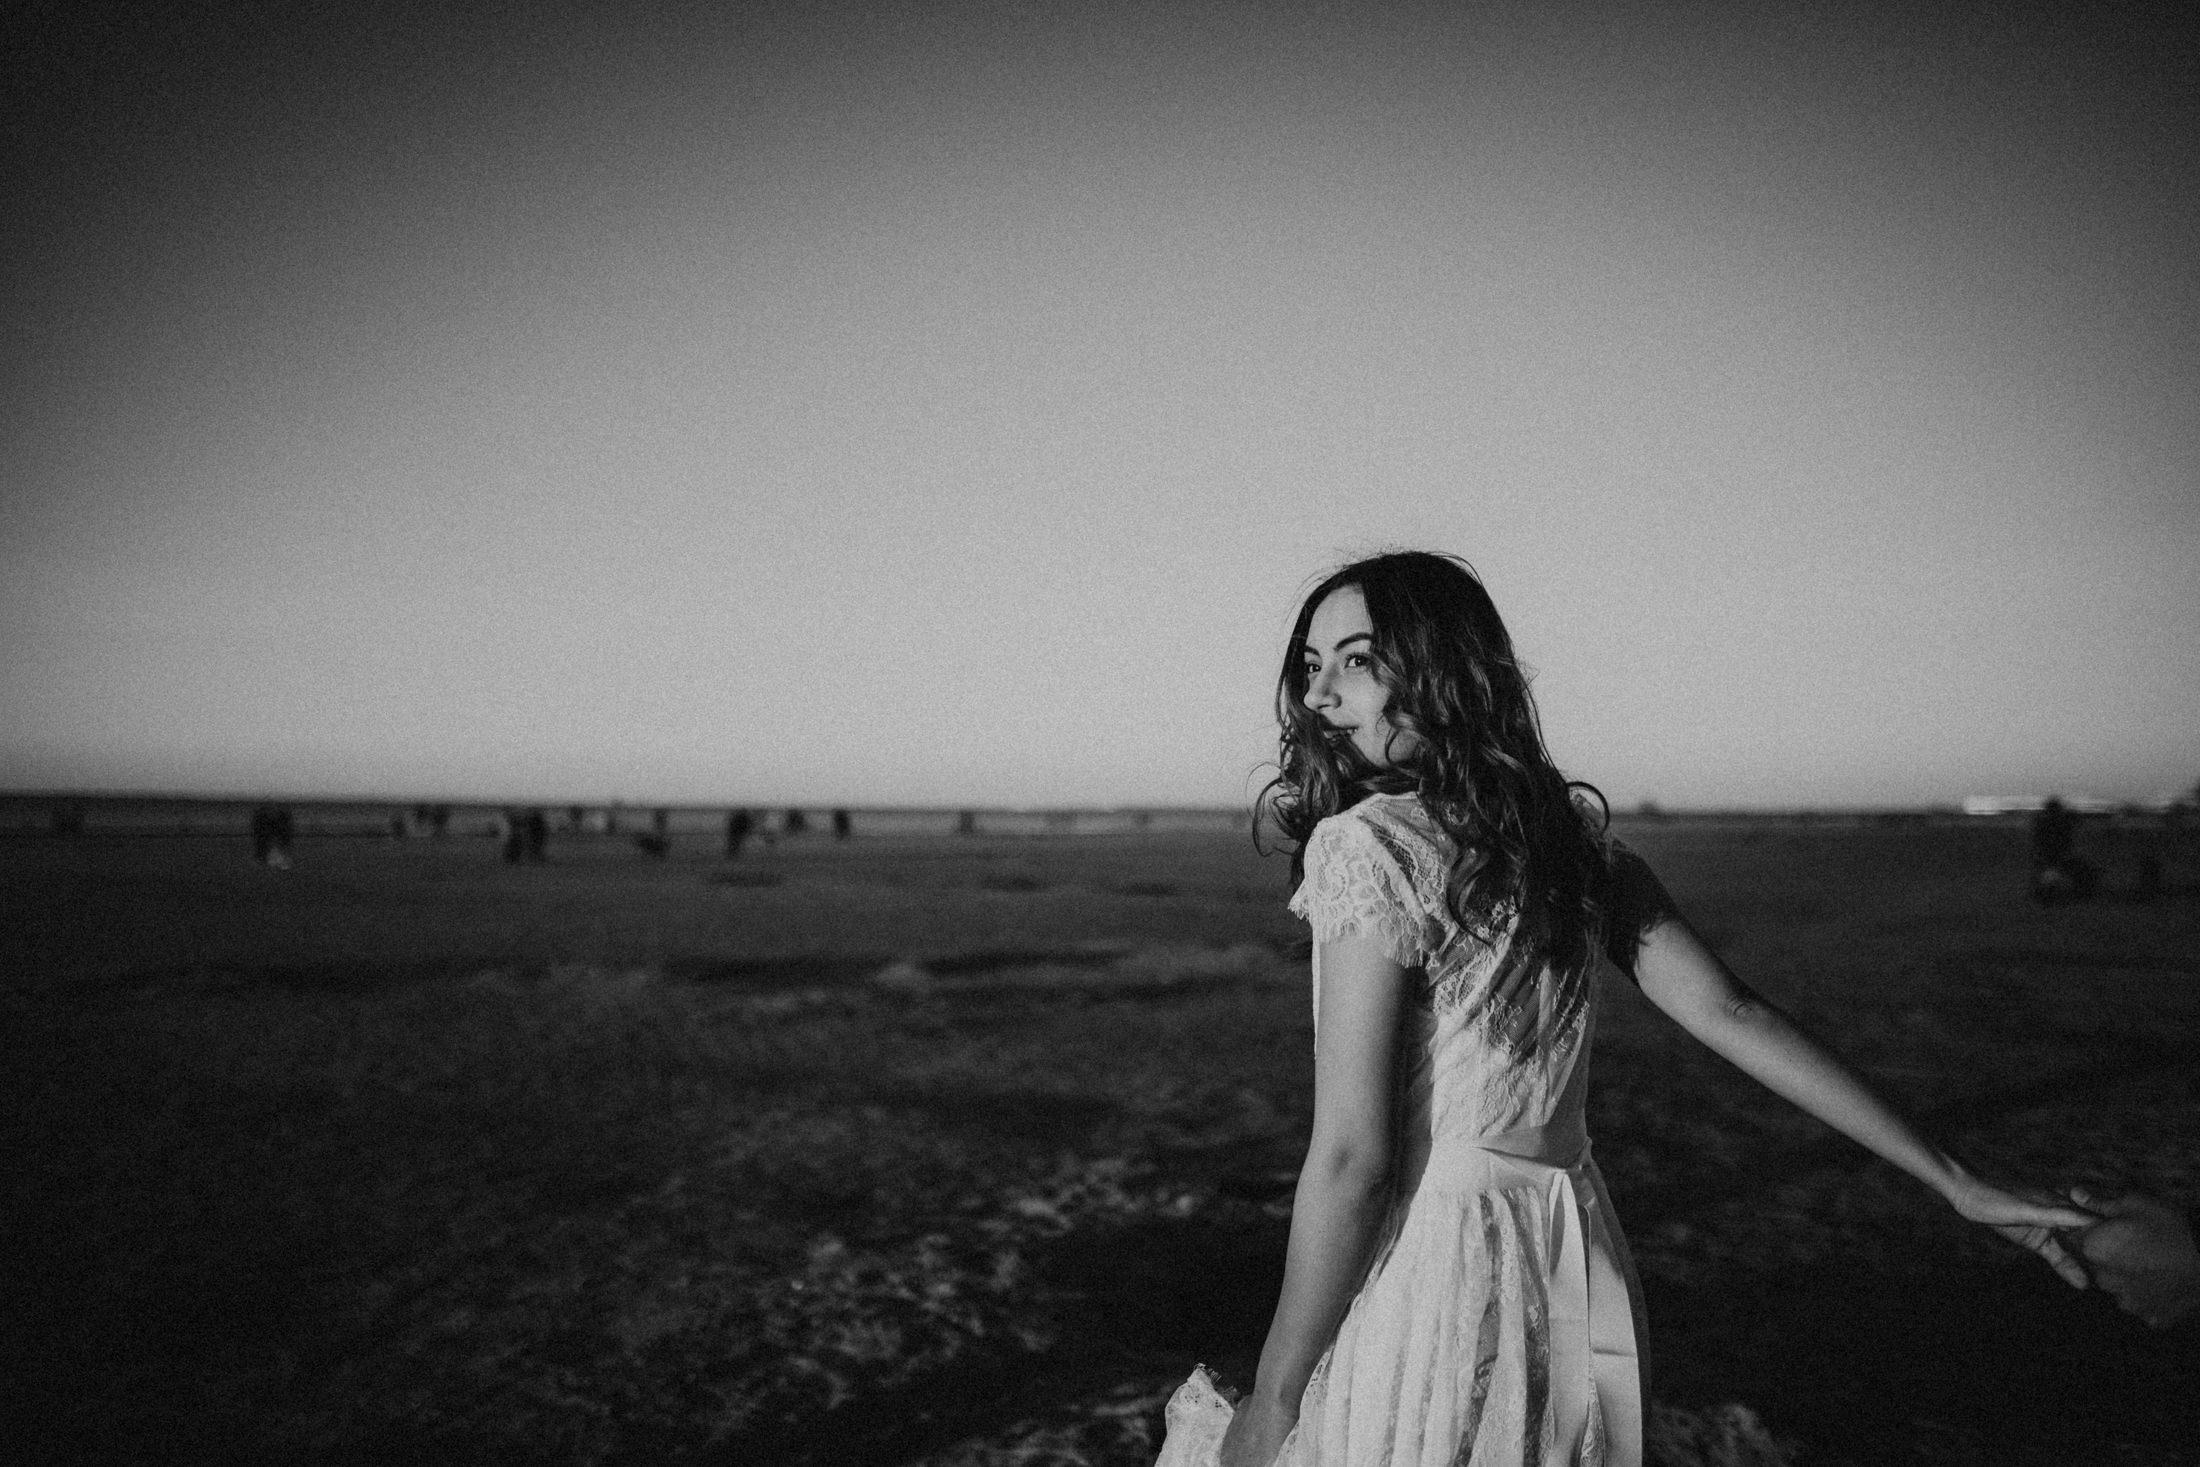 Wedding_Photographer_Mallorca_Daniela-Marquardt_Photography_CanaryIslands_Lanzarote_Iceland_Tuskany_Santorini_Portugal_Schweiz_Austria_Bayern_Elopement_Hochzeitsfotograf_Norddeichich_55